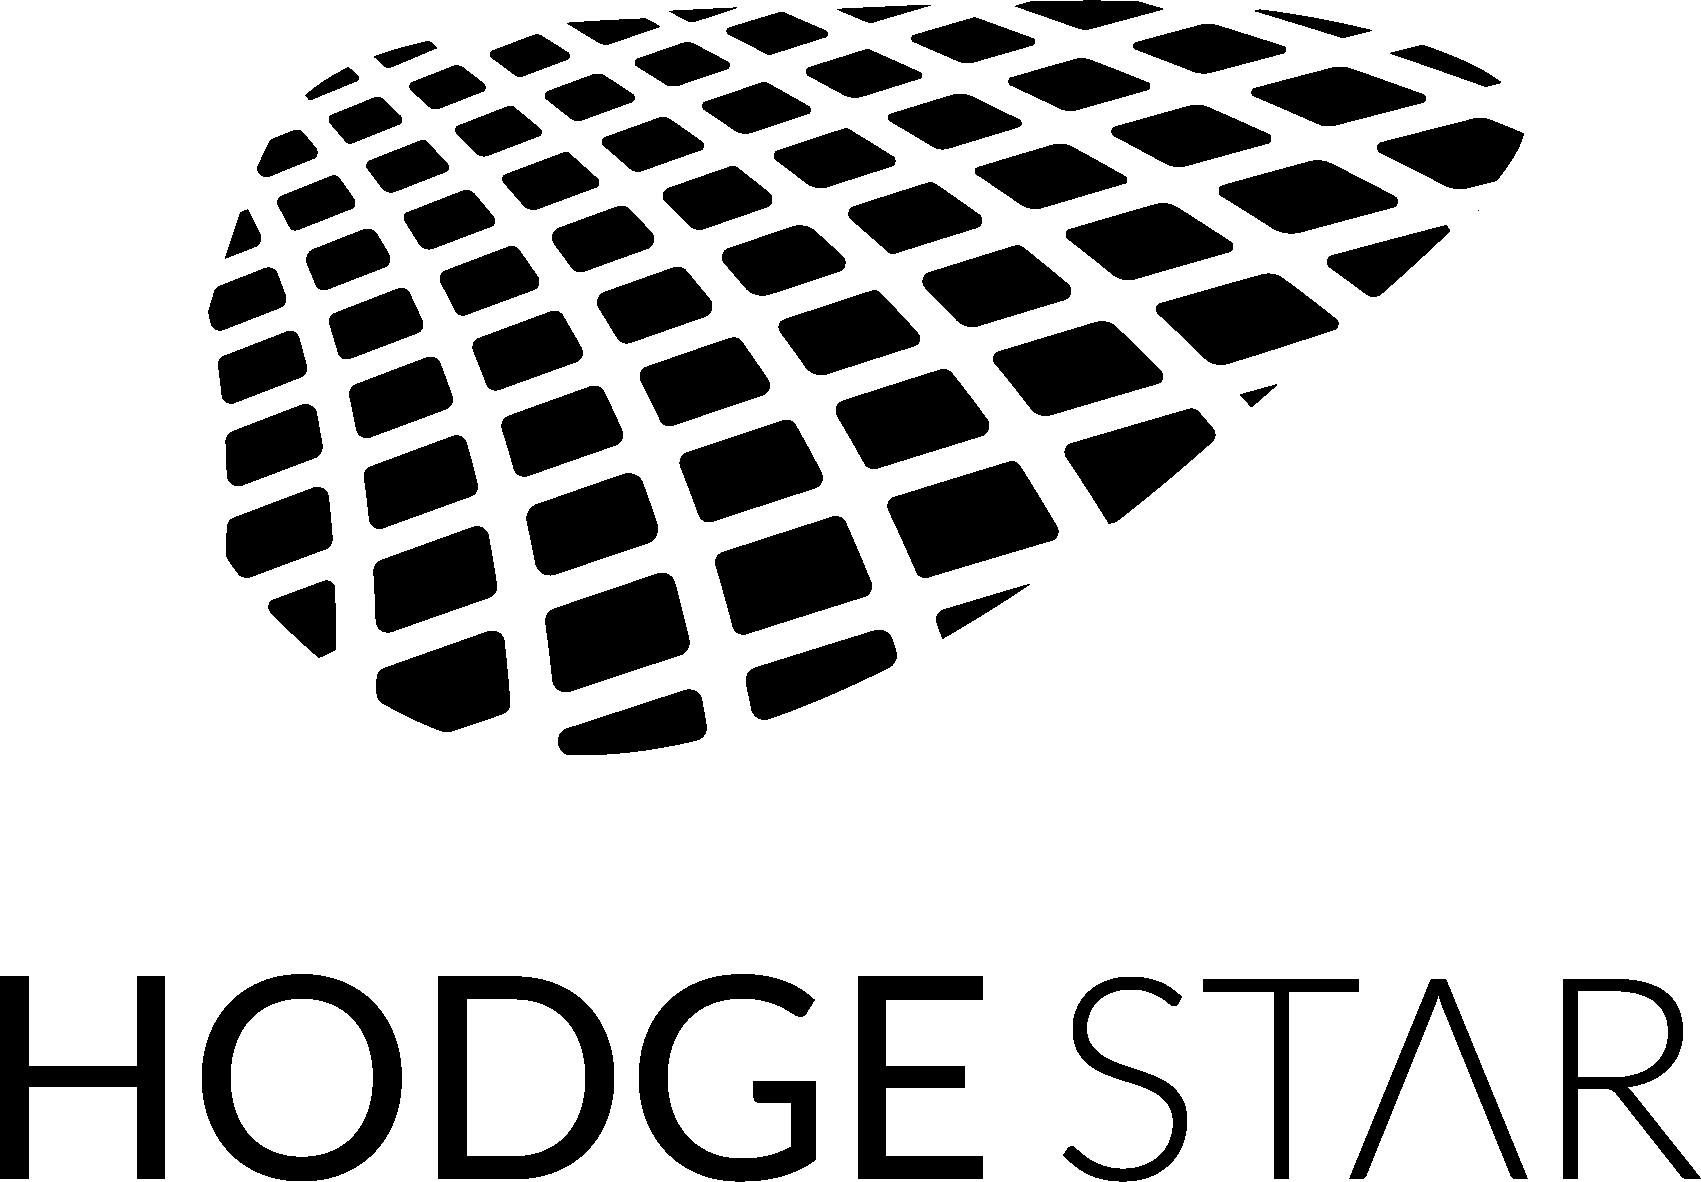 Design a logo for a small mathematical software business